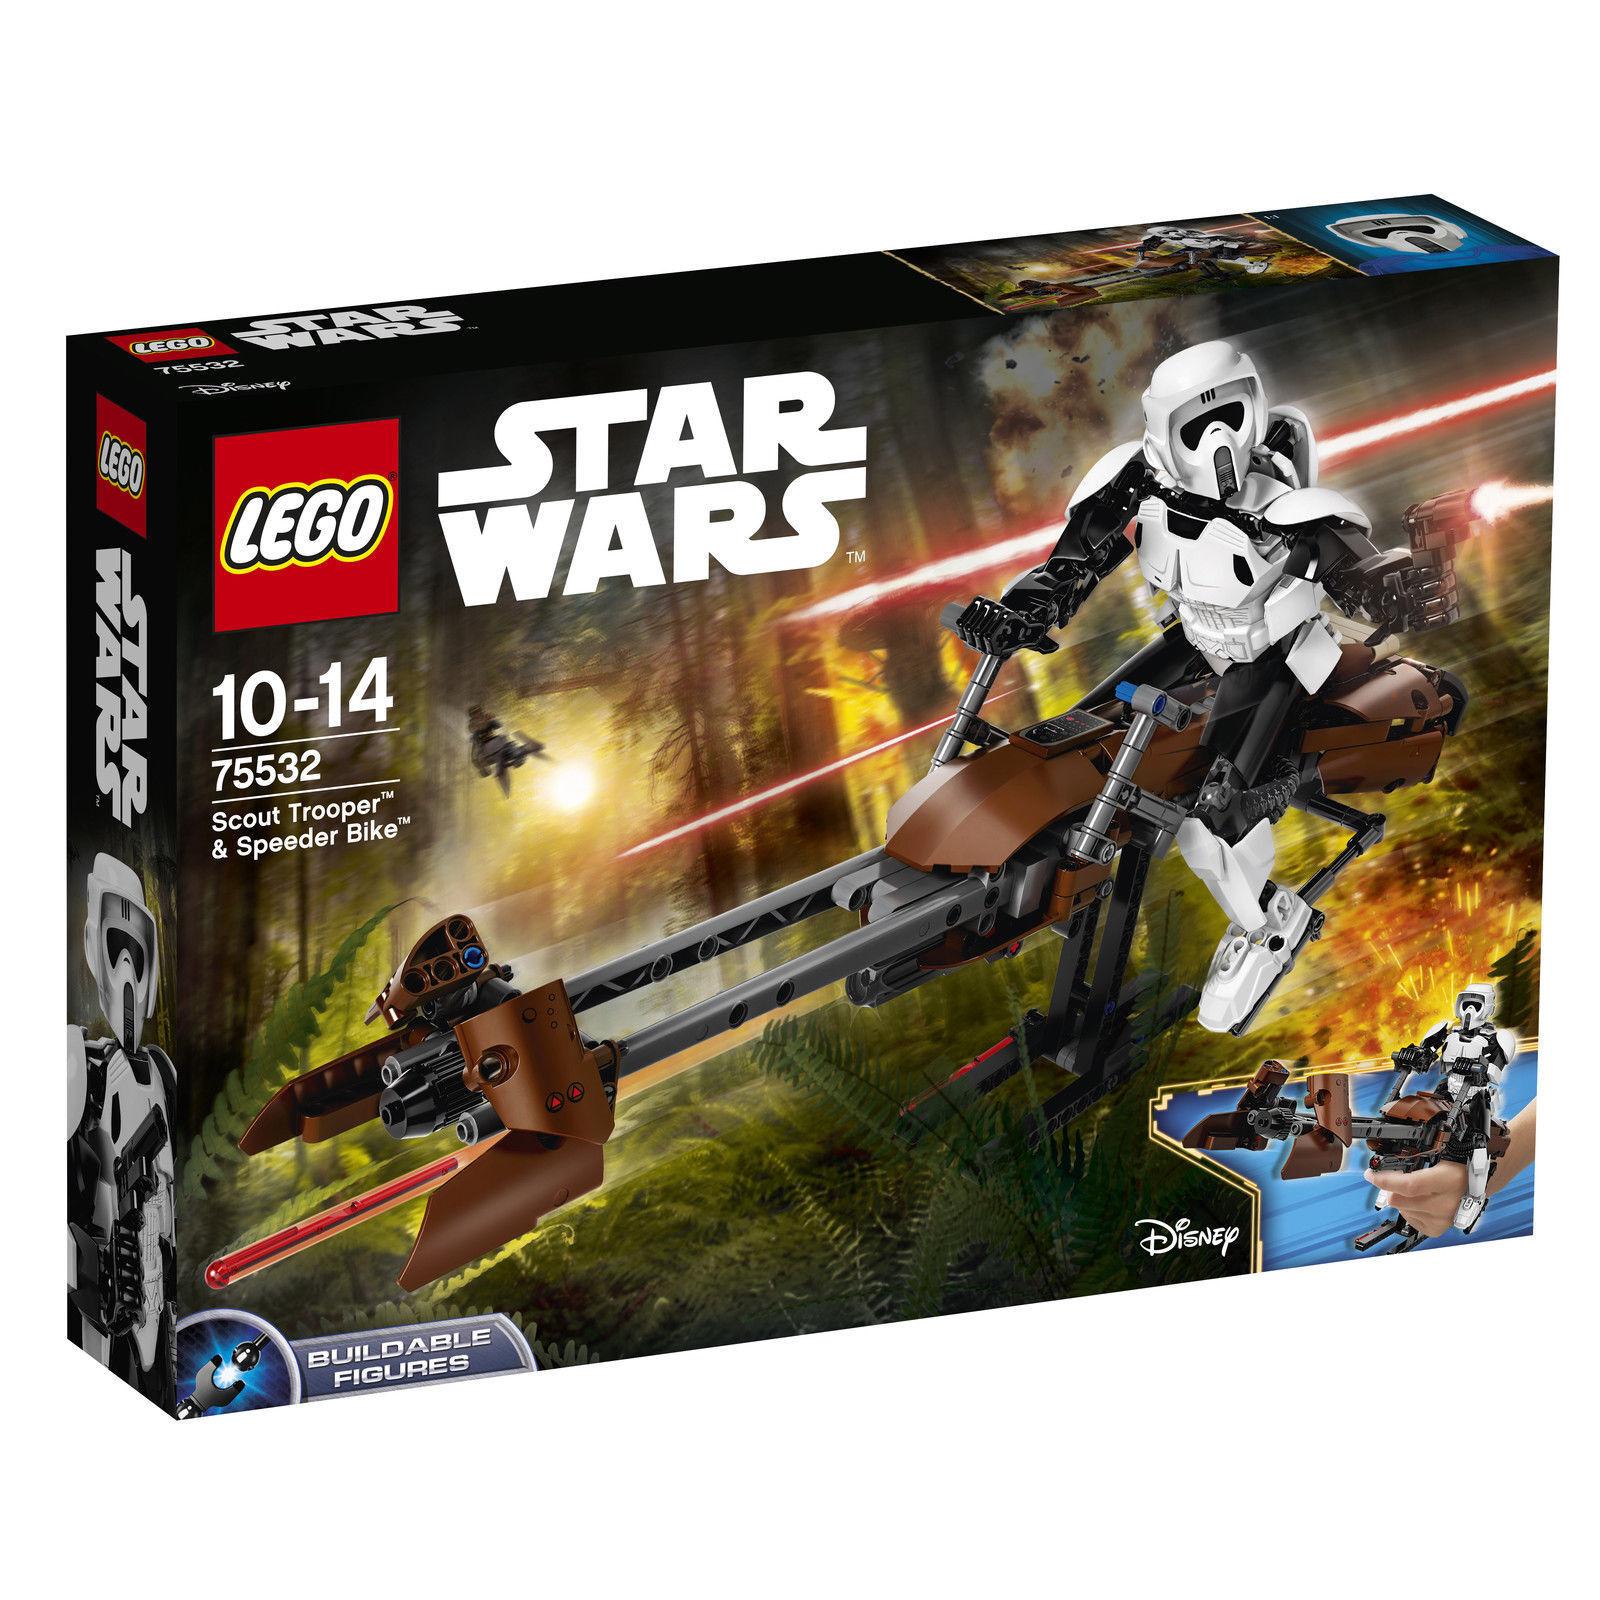 LEGO® Star Wars™ 75532 Scout Trooper™ Trooper™ Trooper™ & Speeder Bike™ NEW OVP NEW MISB NRFB f8fea3